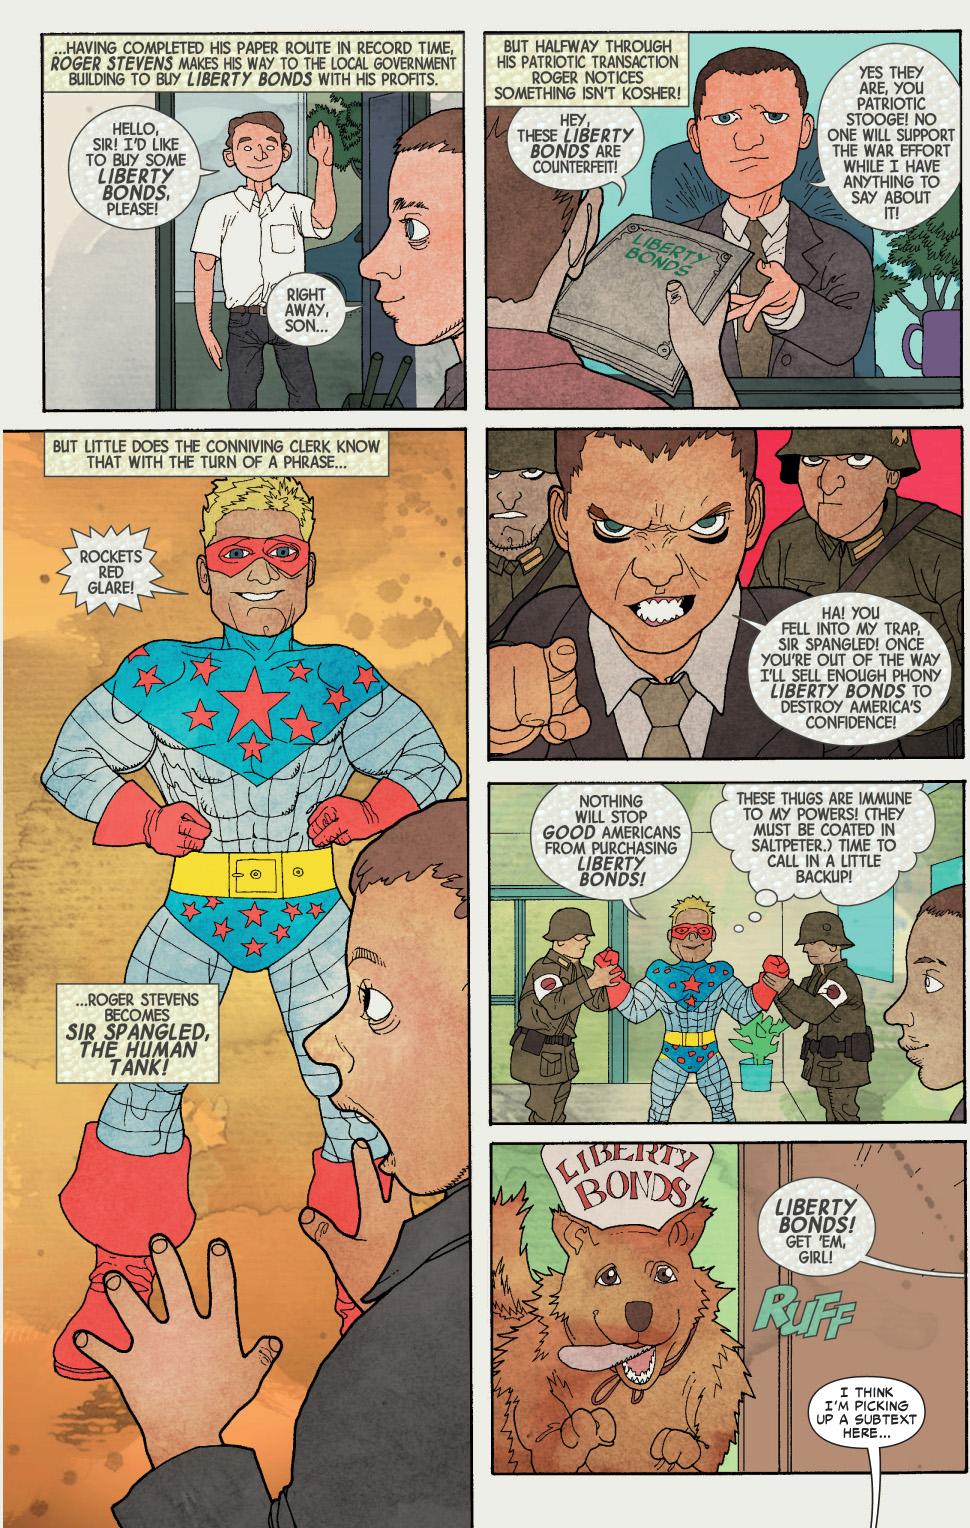 captain america drew comics as a kid